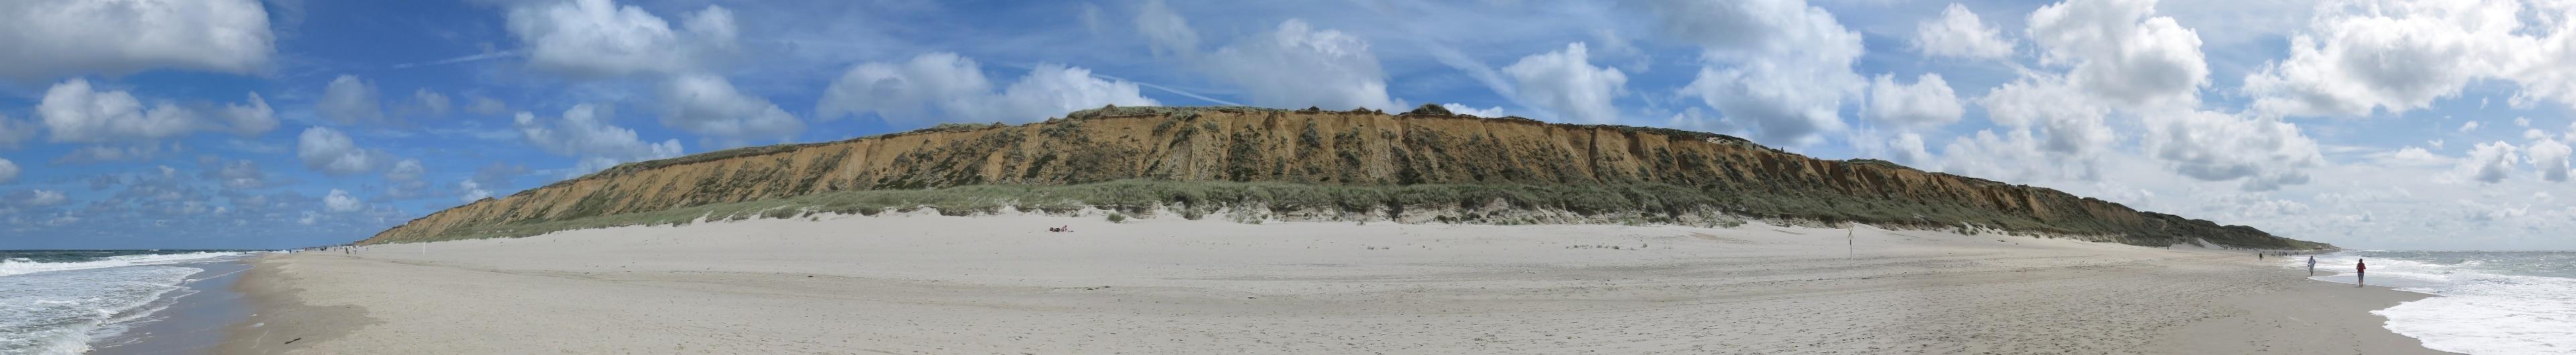 Kampen Beach, Kampen (Sylt), Schleswig-Holstein, Germany